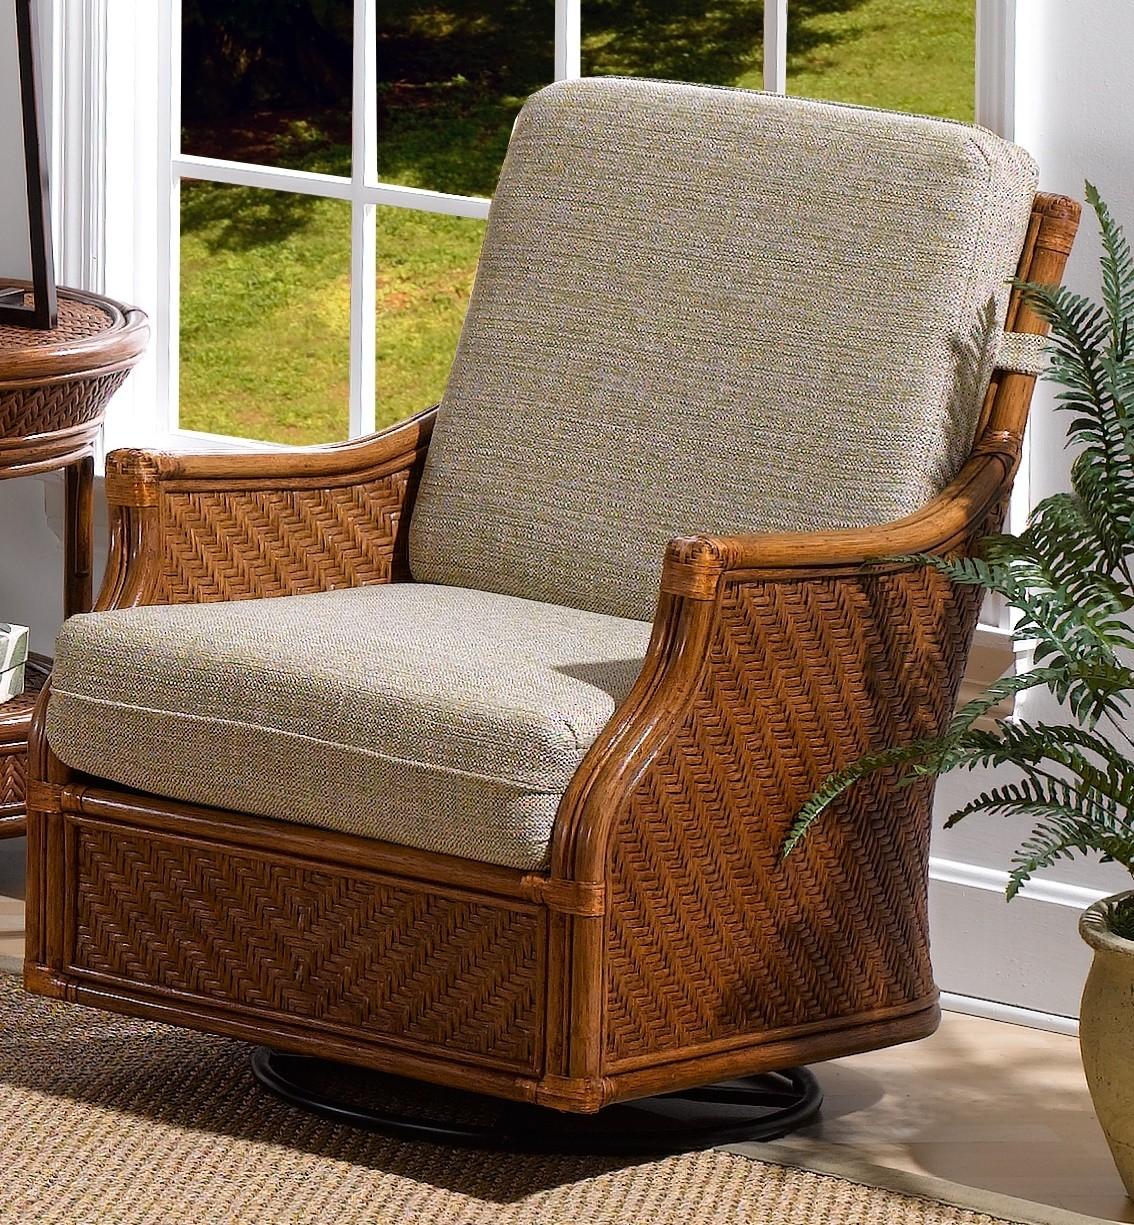 Classic Rattan Edgewater Swivel Glider Chair - Dinette Online